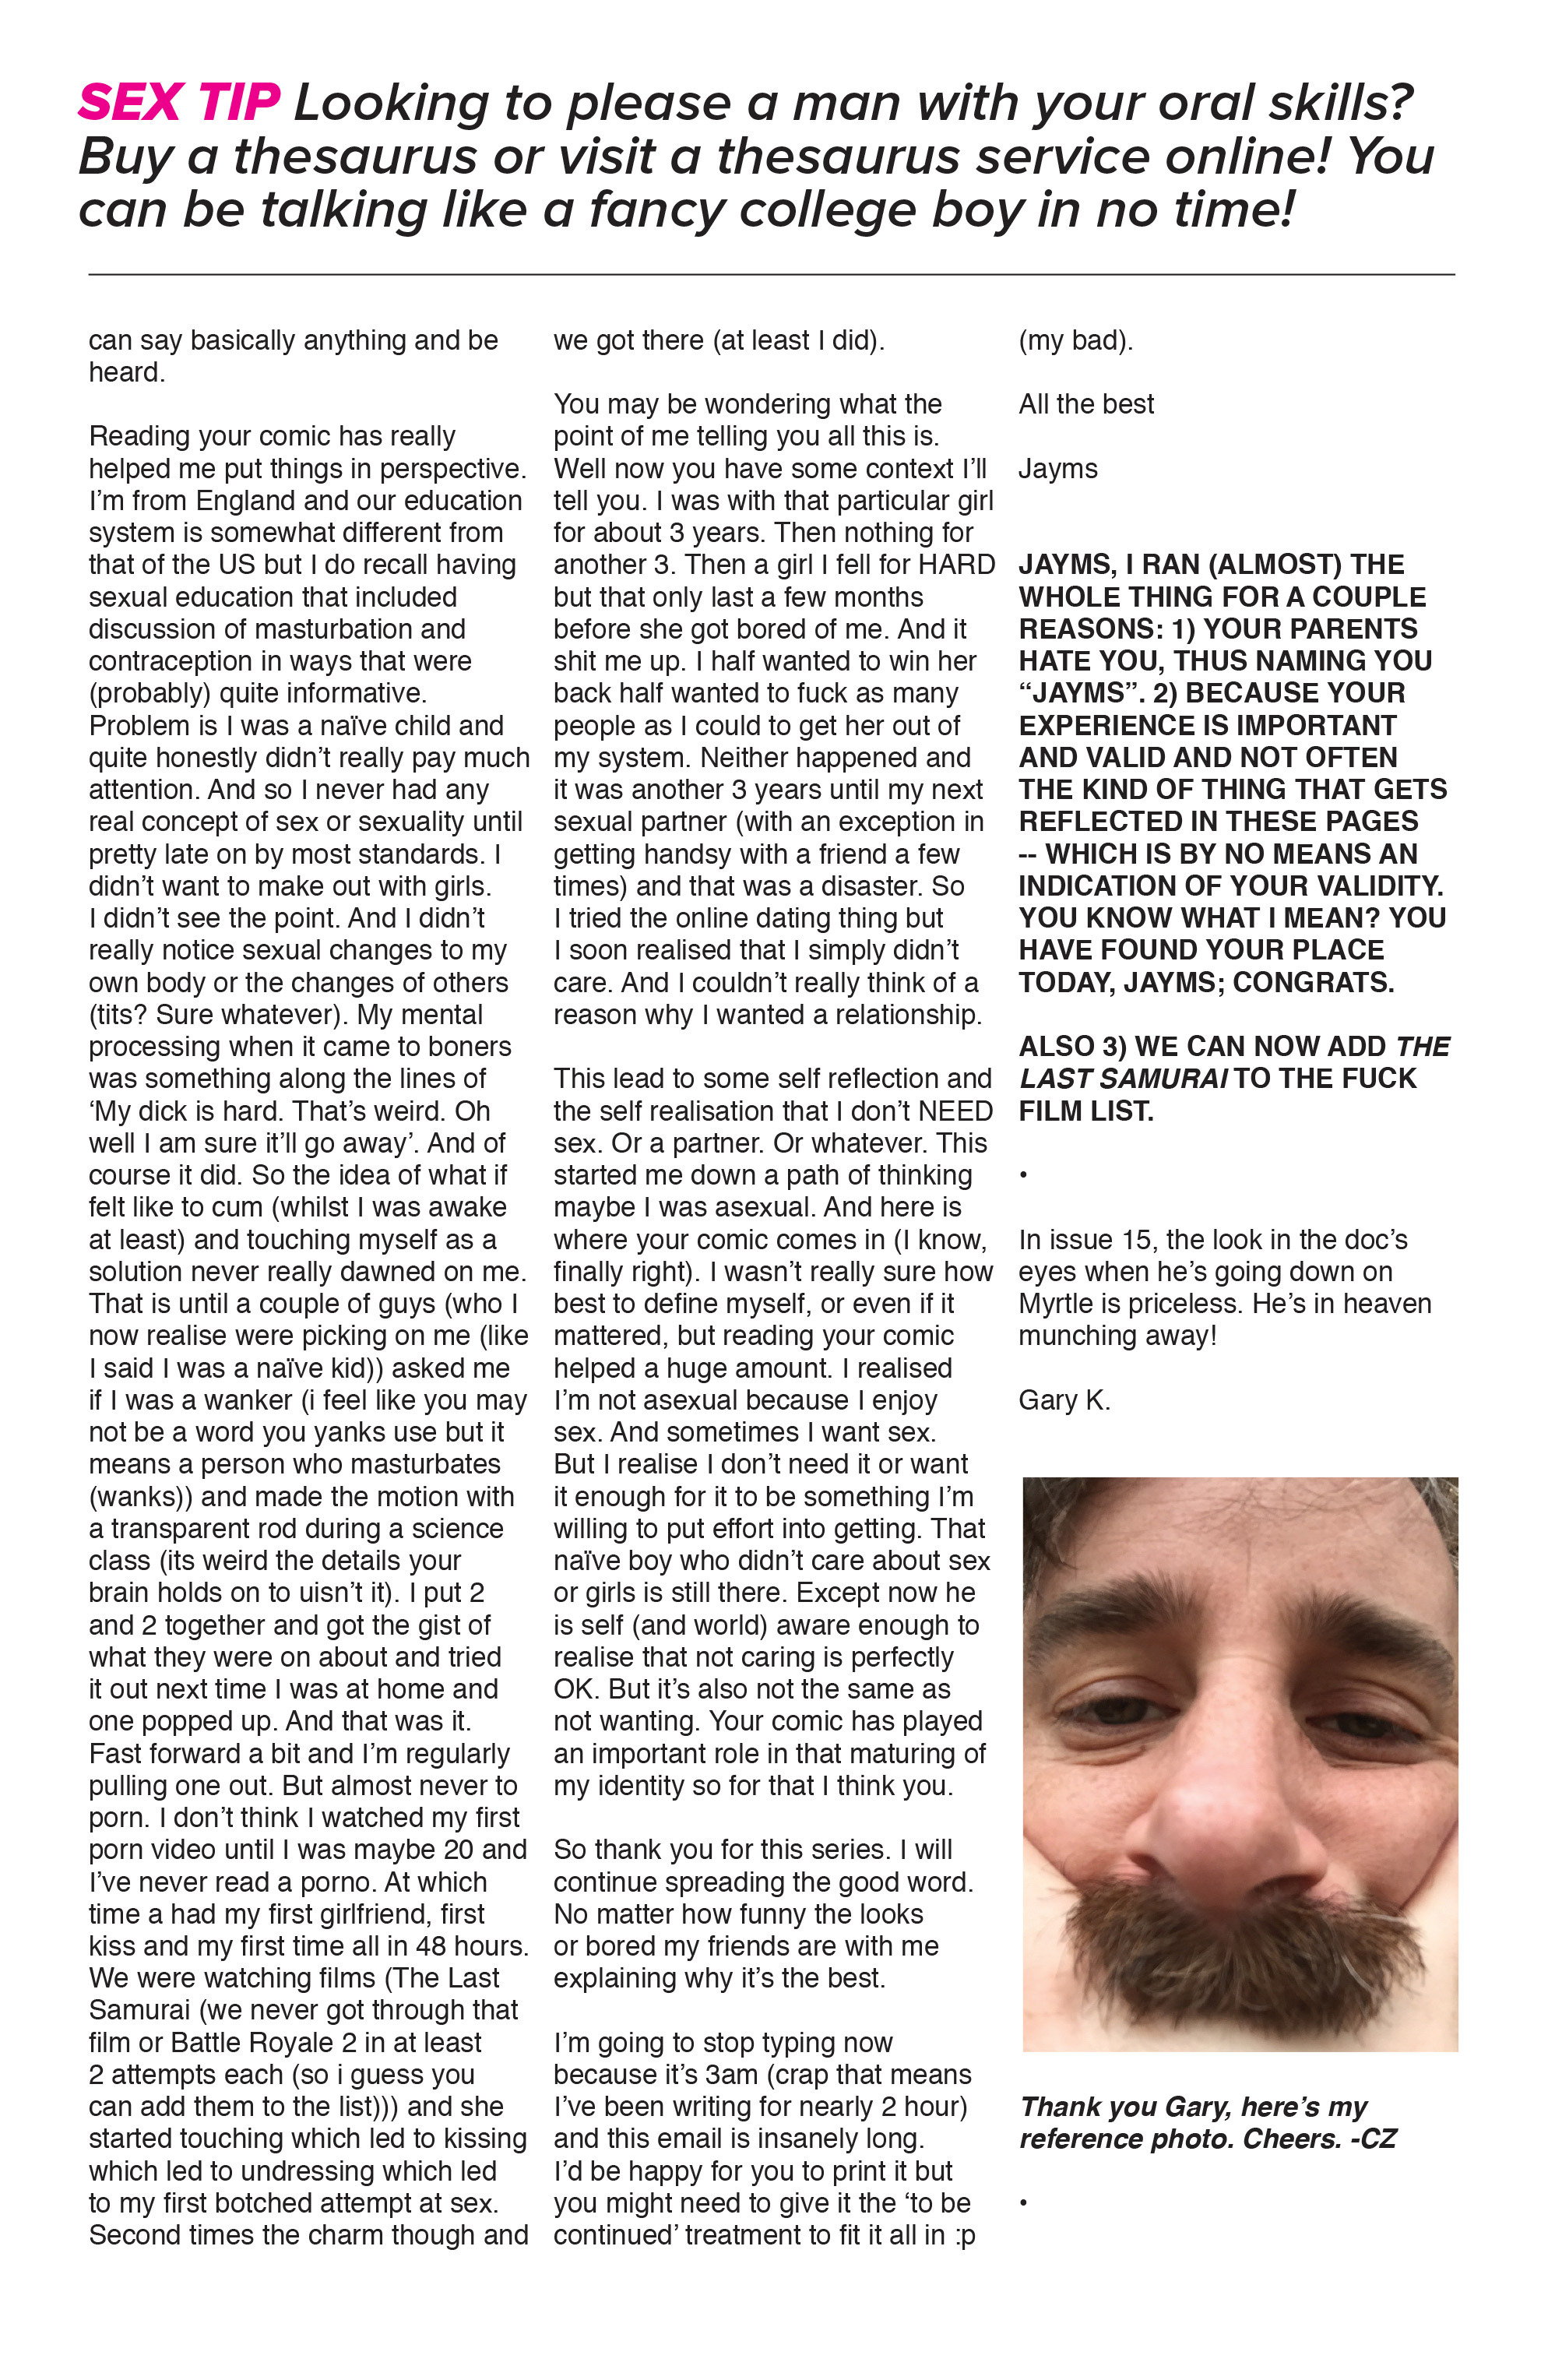 Read online Sex Criminals comic -  Issue #16 - 34